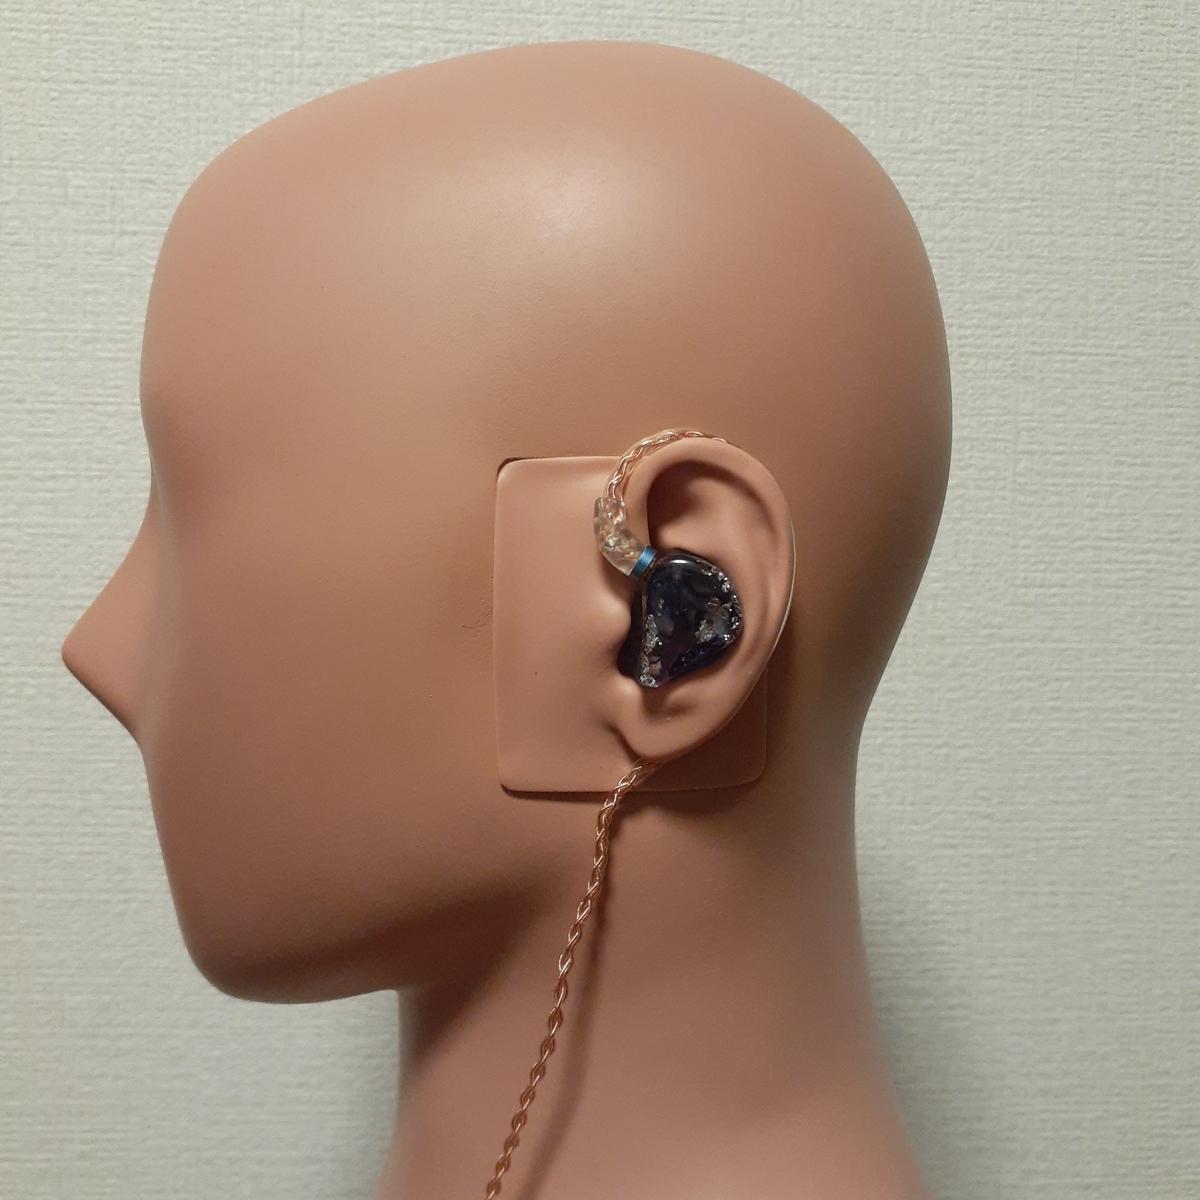 Audiosense DT600